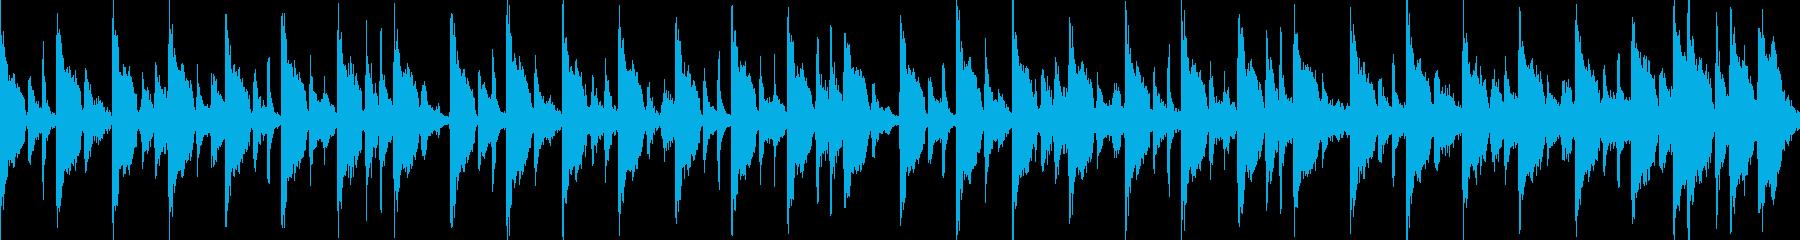 (loop)かけ足ハウスの再生済みの波形